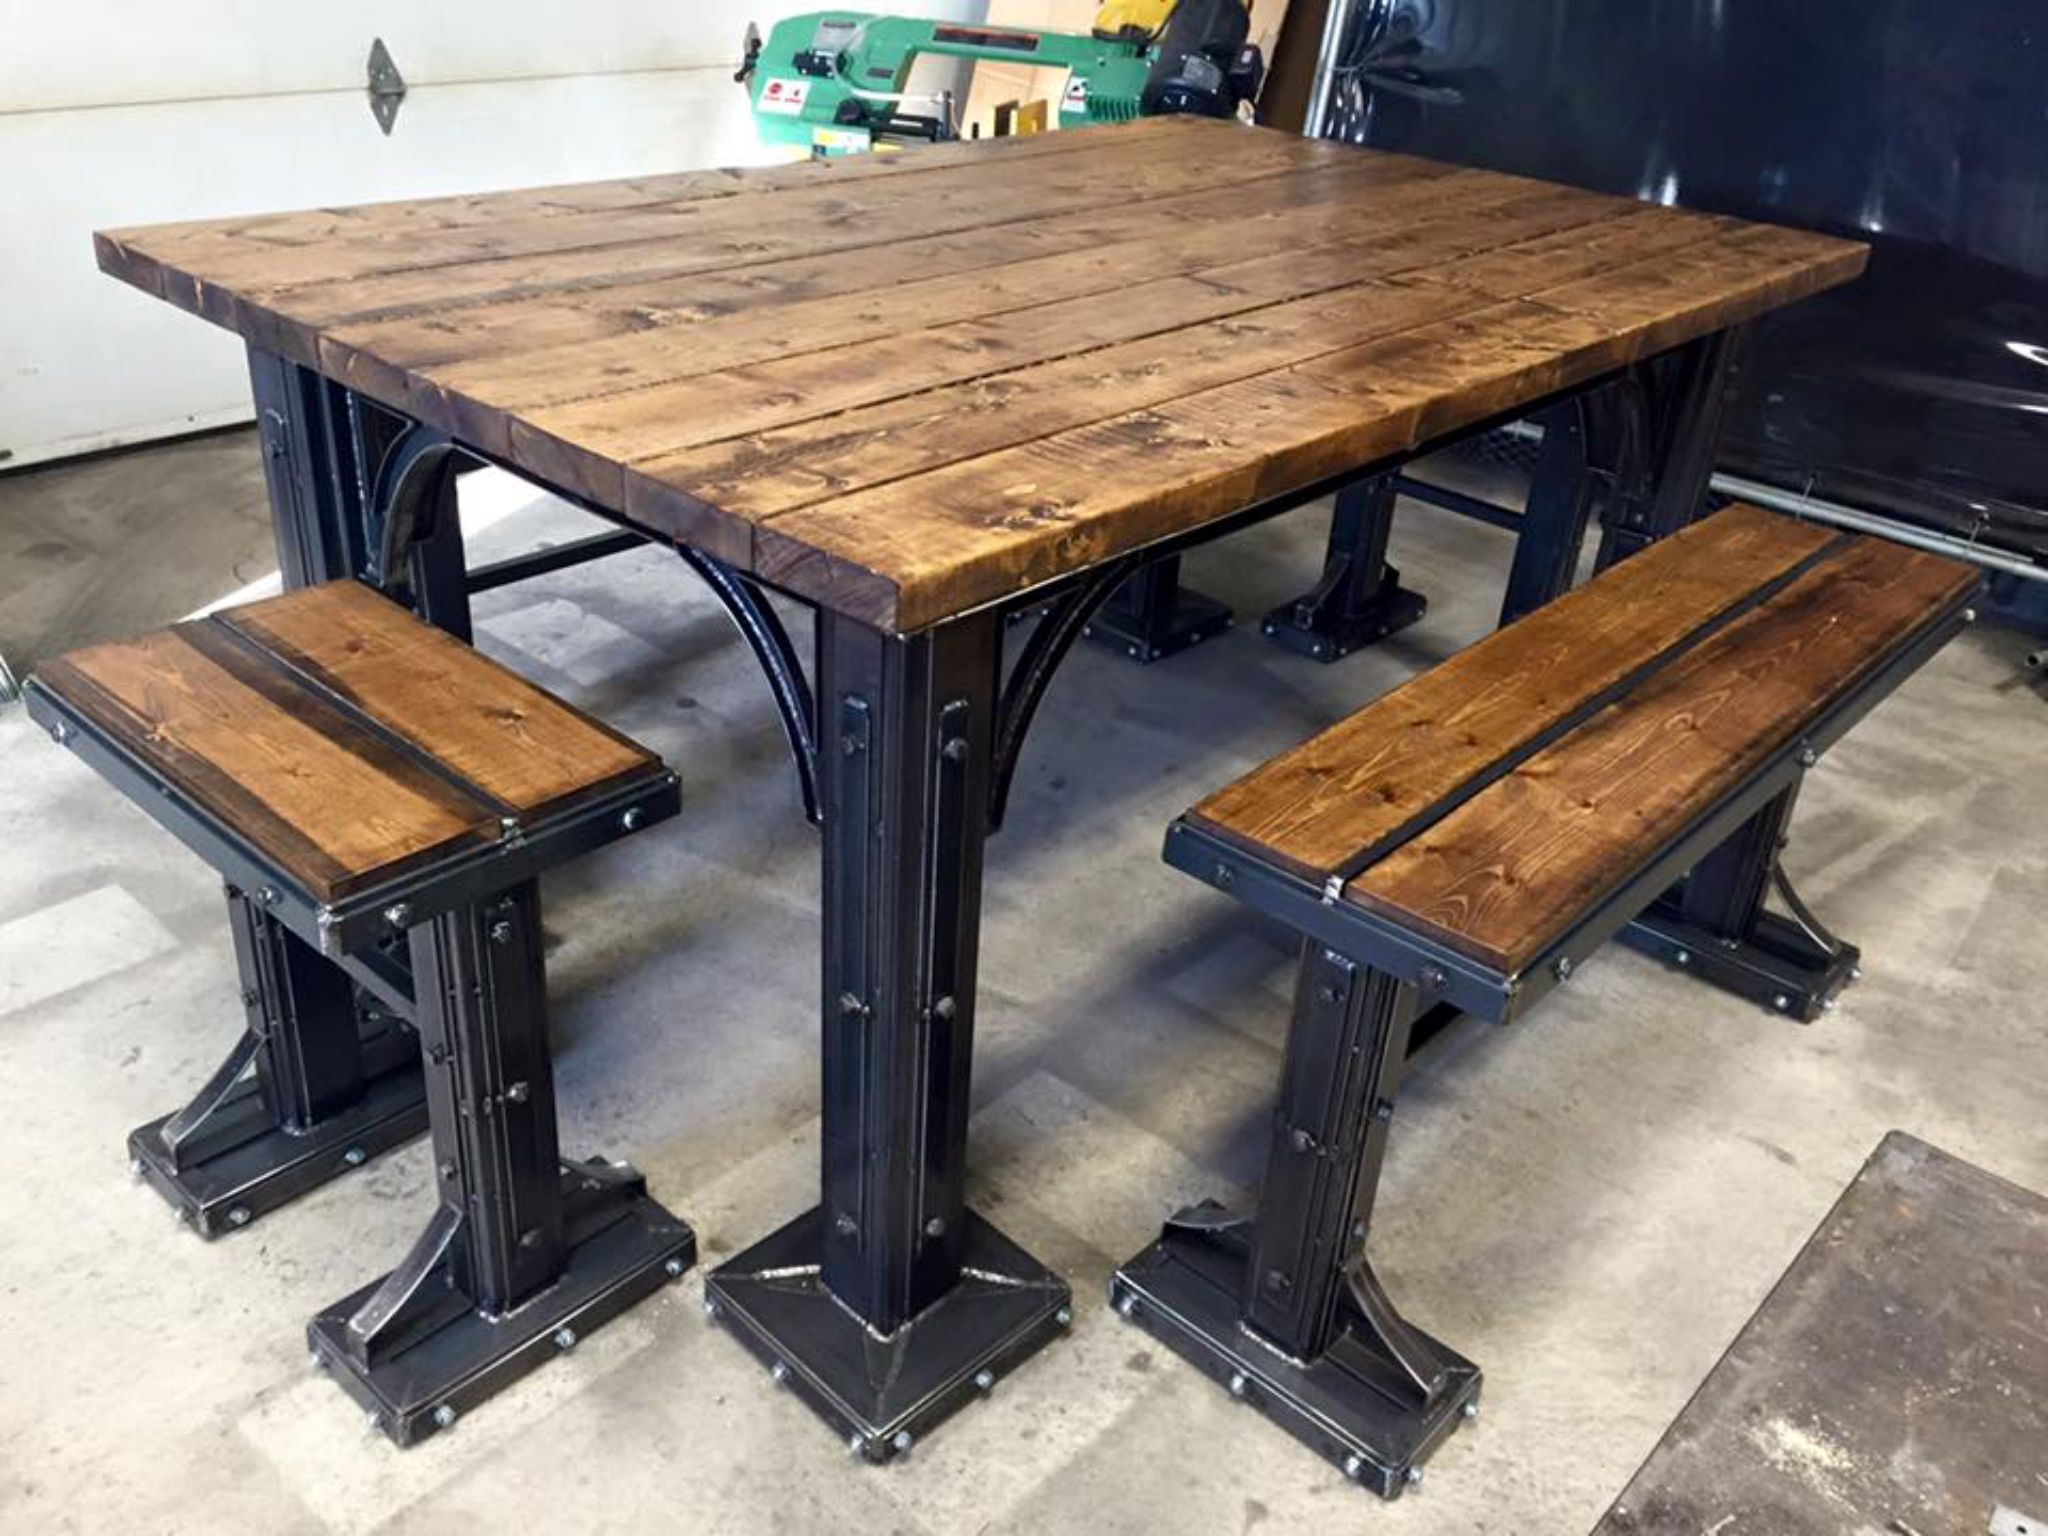 Souduregenec table metal bois houtwerk idees for Muebles industriales metal baratos